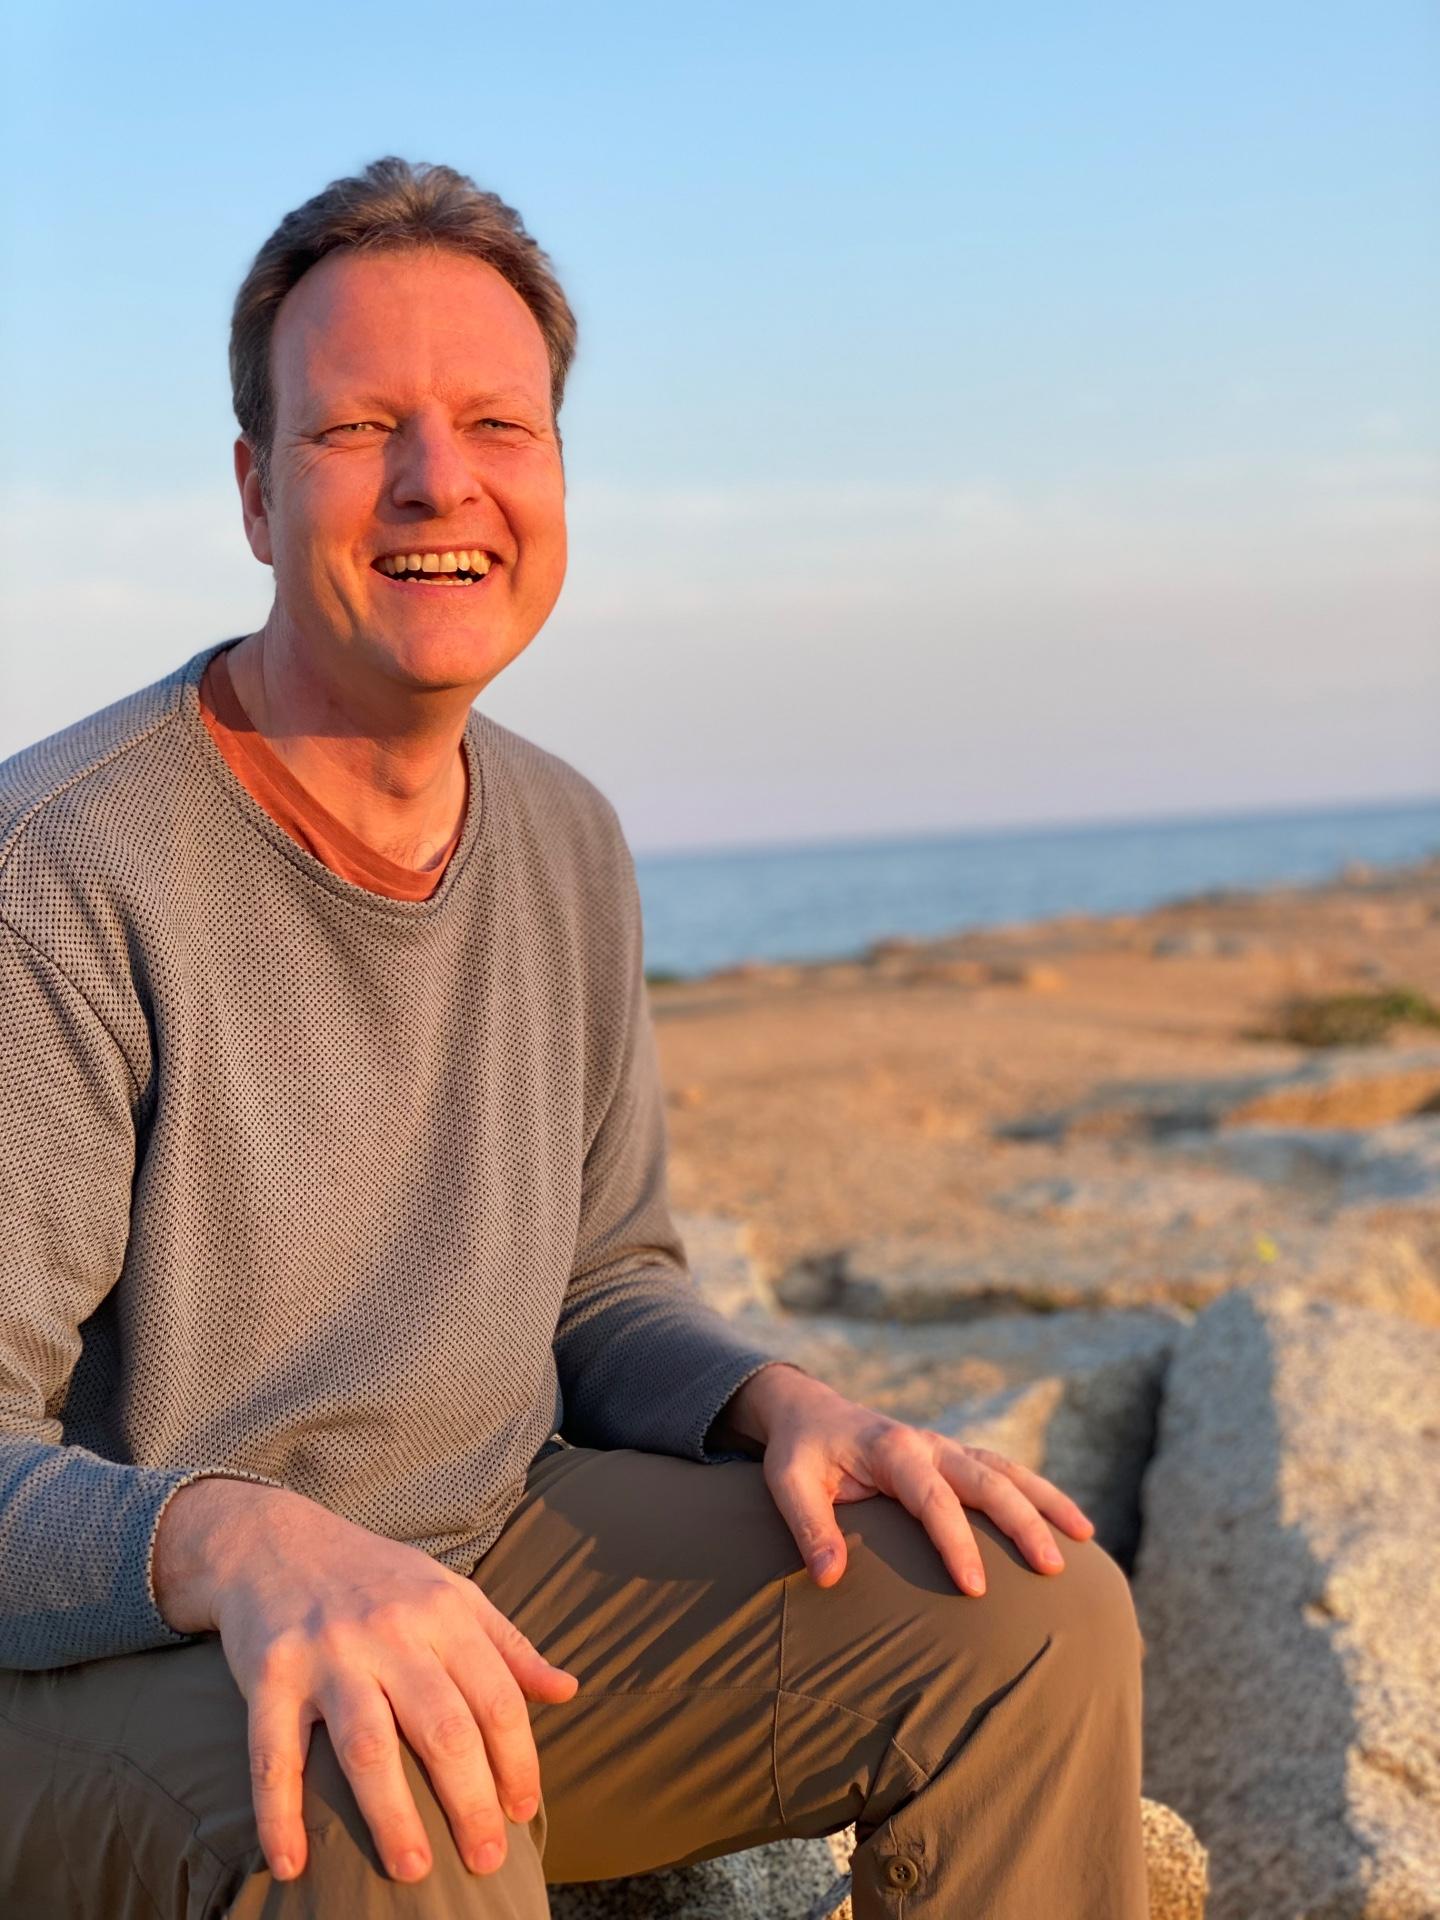 Hendrik Roggemann am Strand lachend